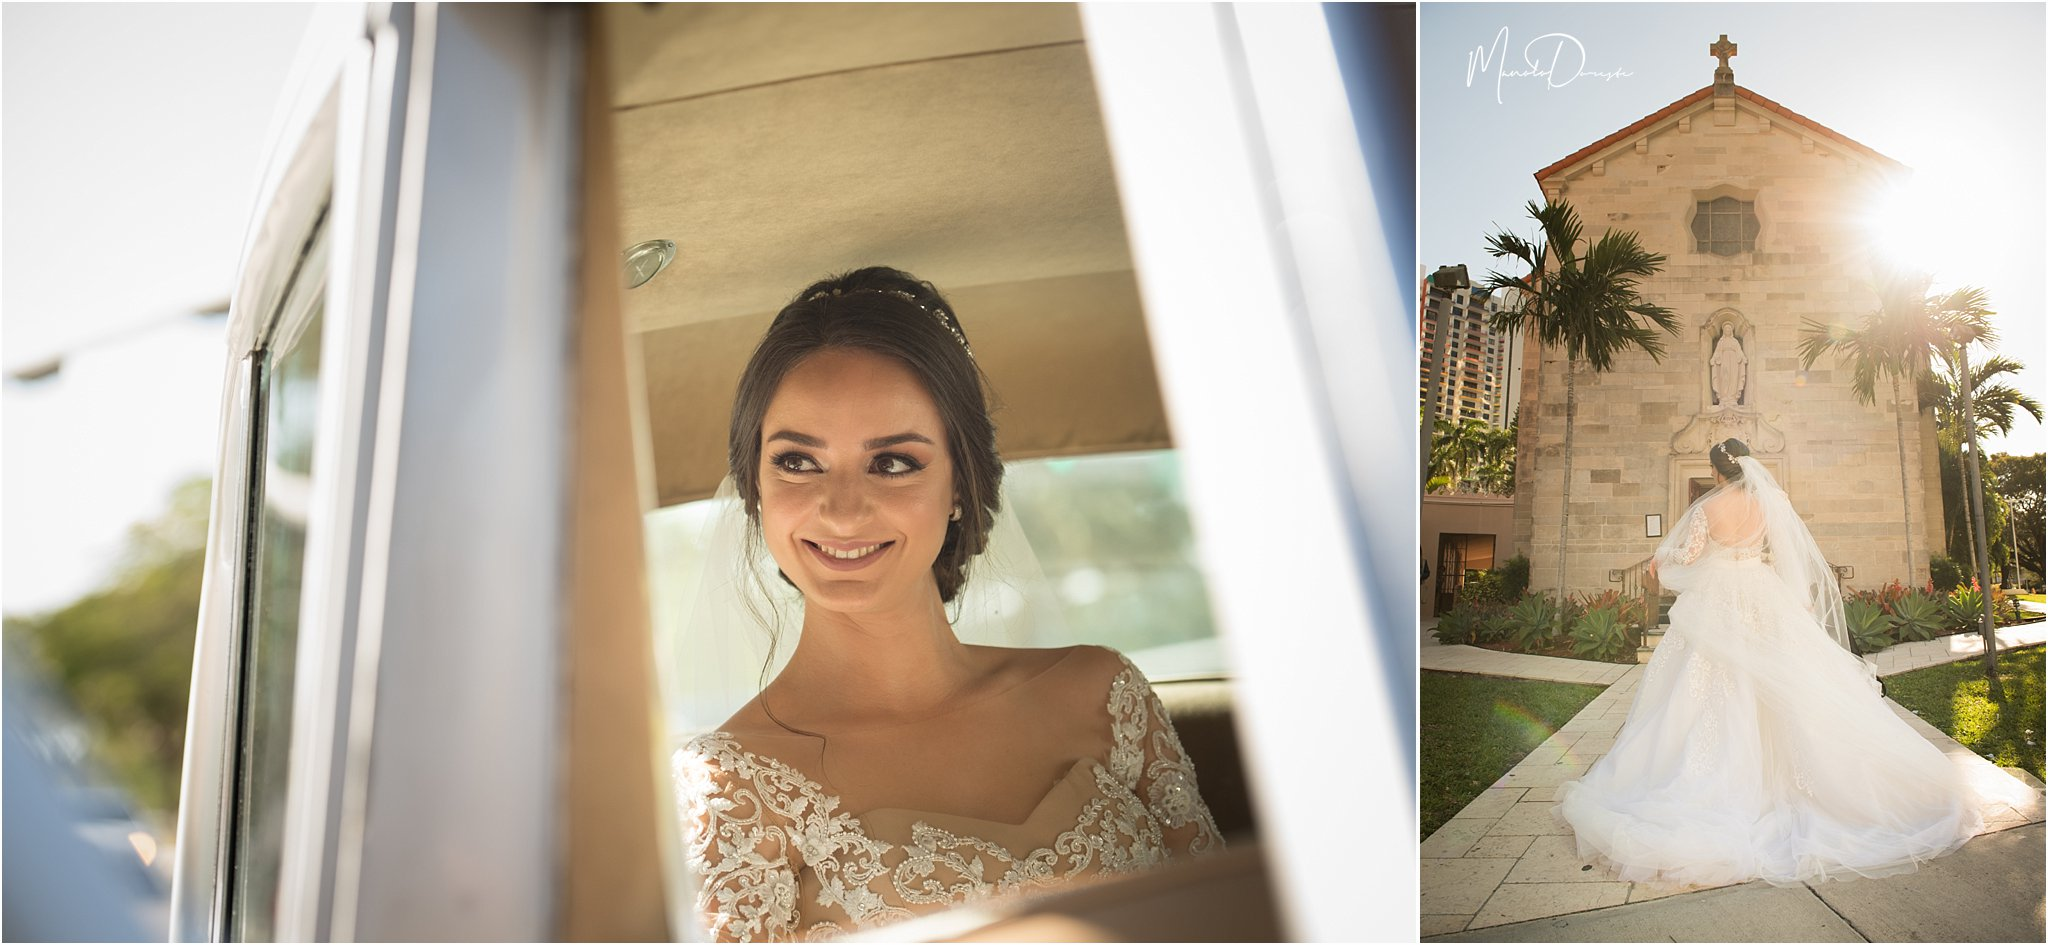 00717_ManoloDoreste_InFocusStudios_Wedding_Family_Photography_Miami_MiamiPhotographer.jpg